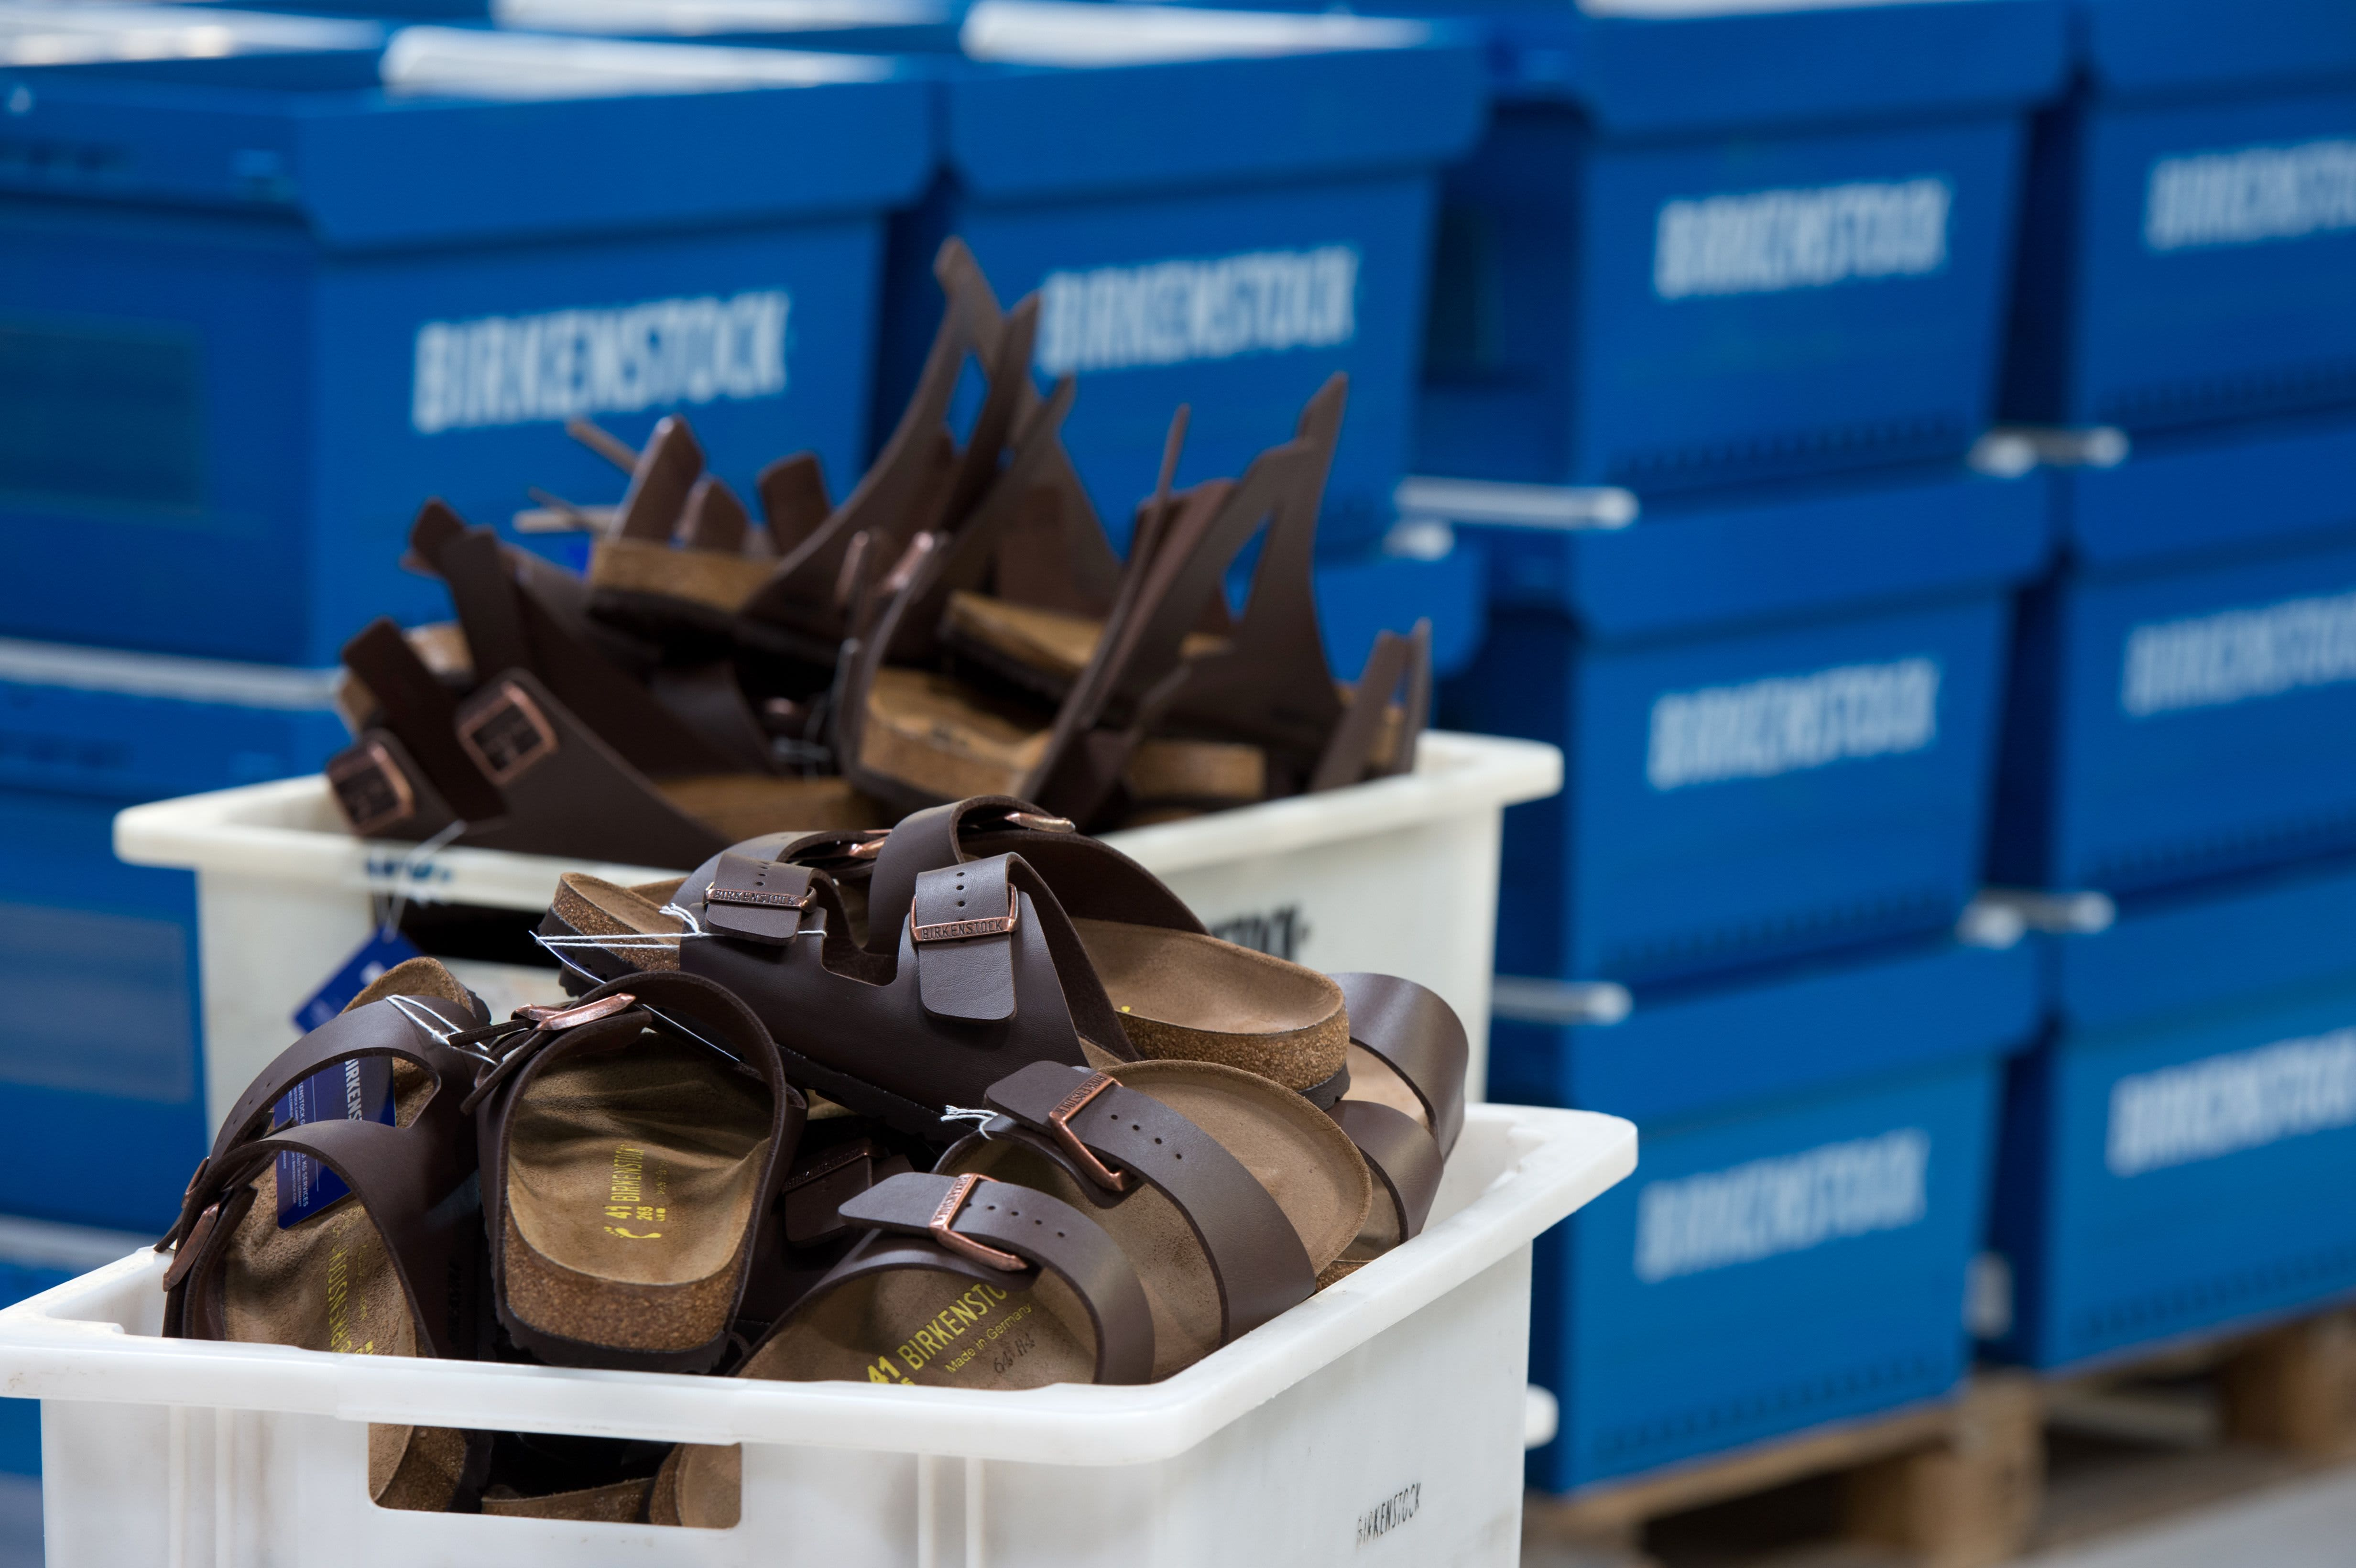 Birkenstock quits Amazon in US after